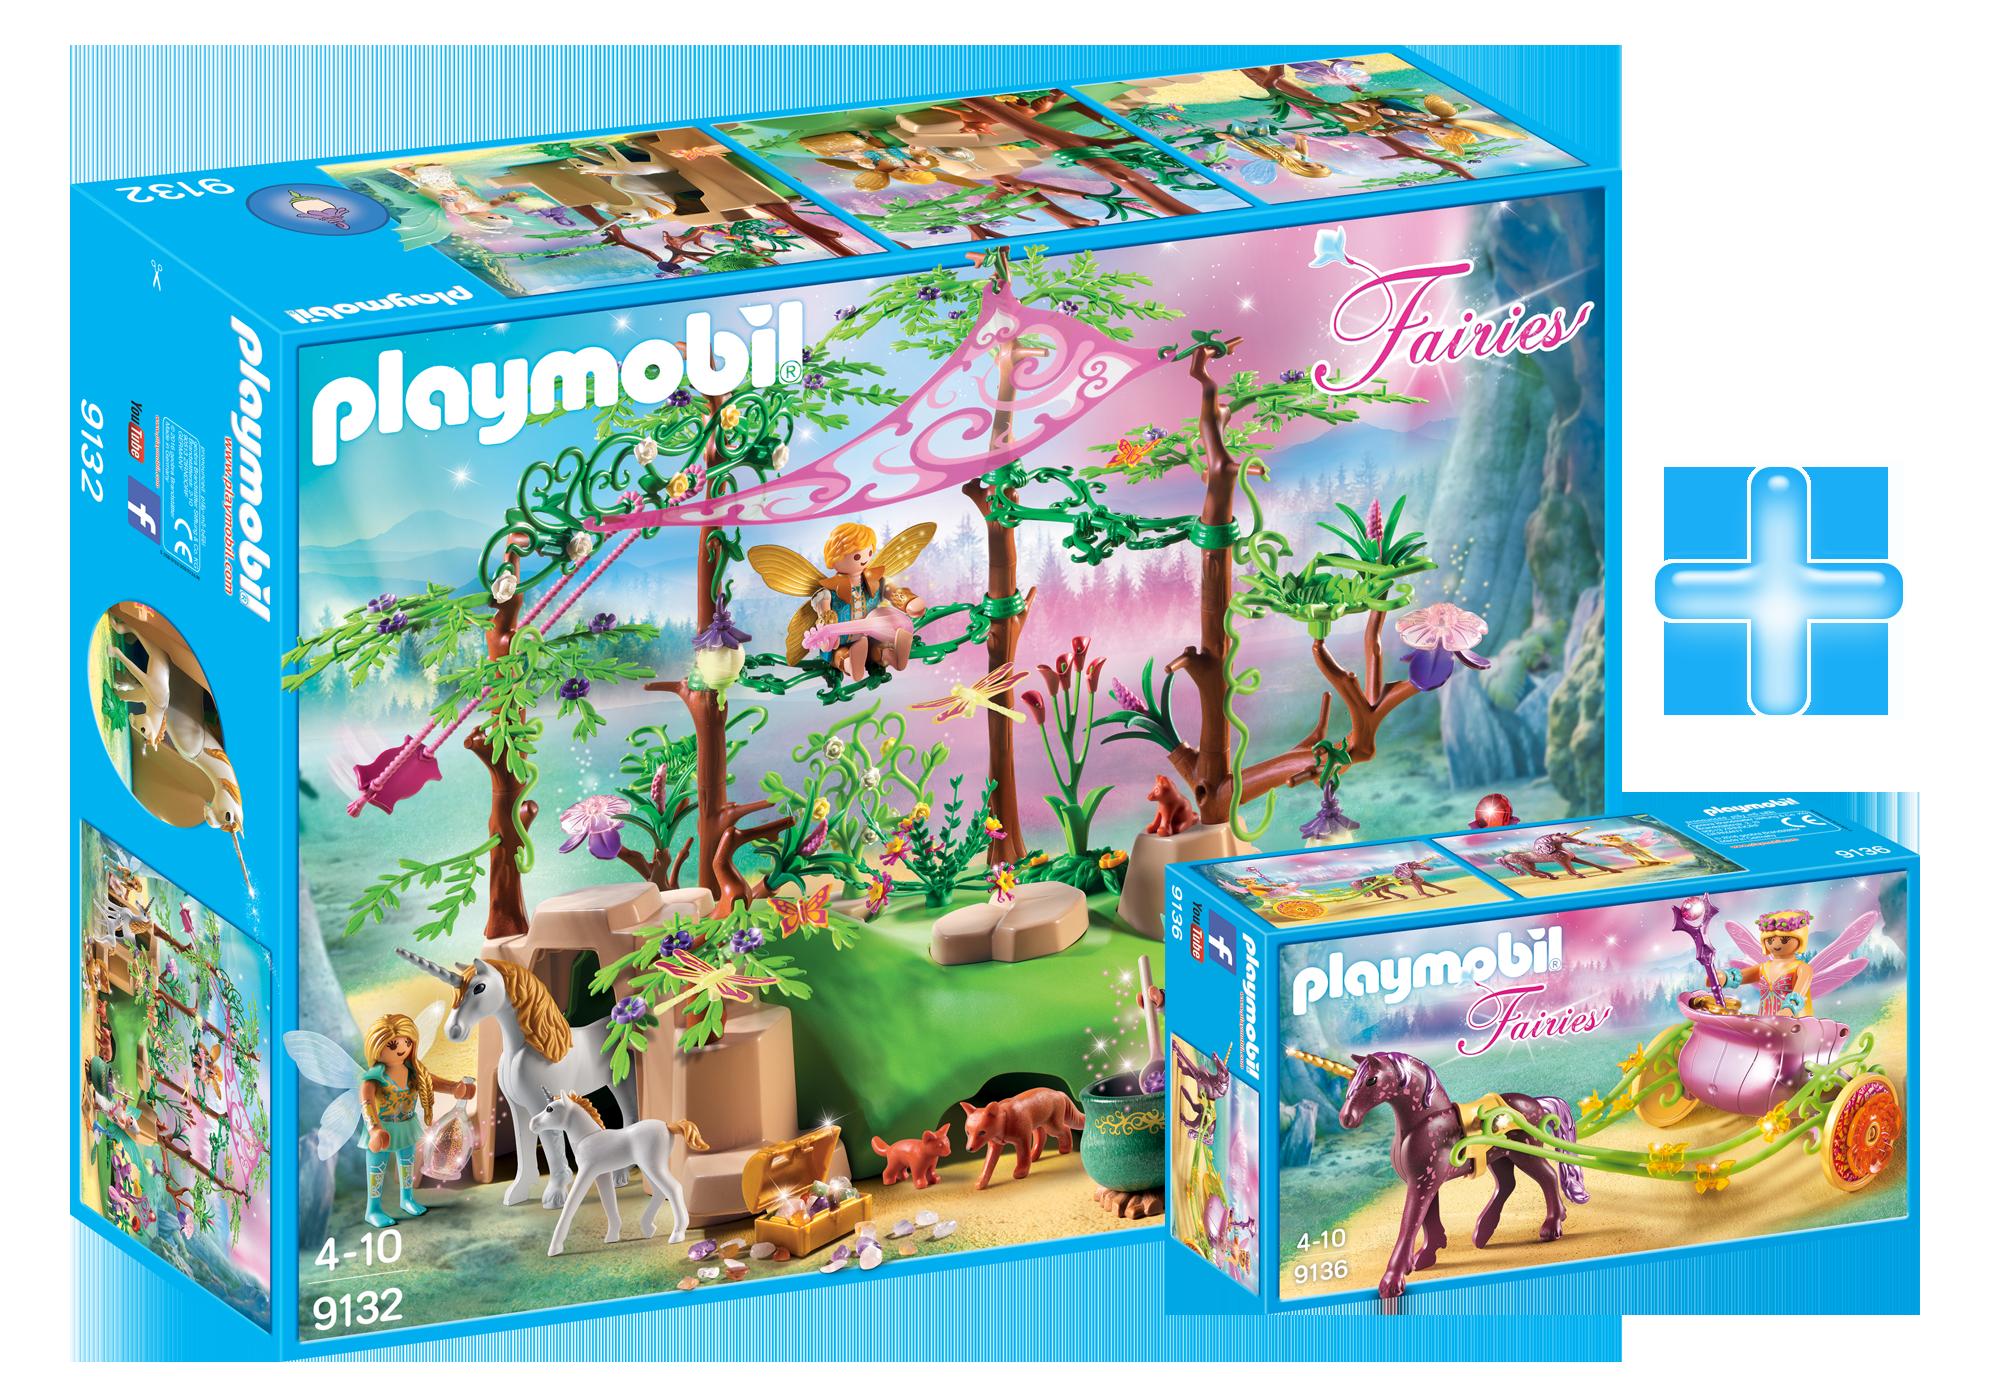 http://media.playmobil.com/i/playmobil/PM1905G_product_detail/Pack Promocional Hadas